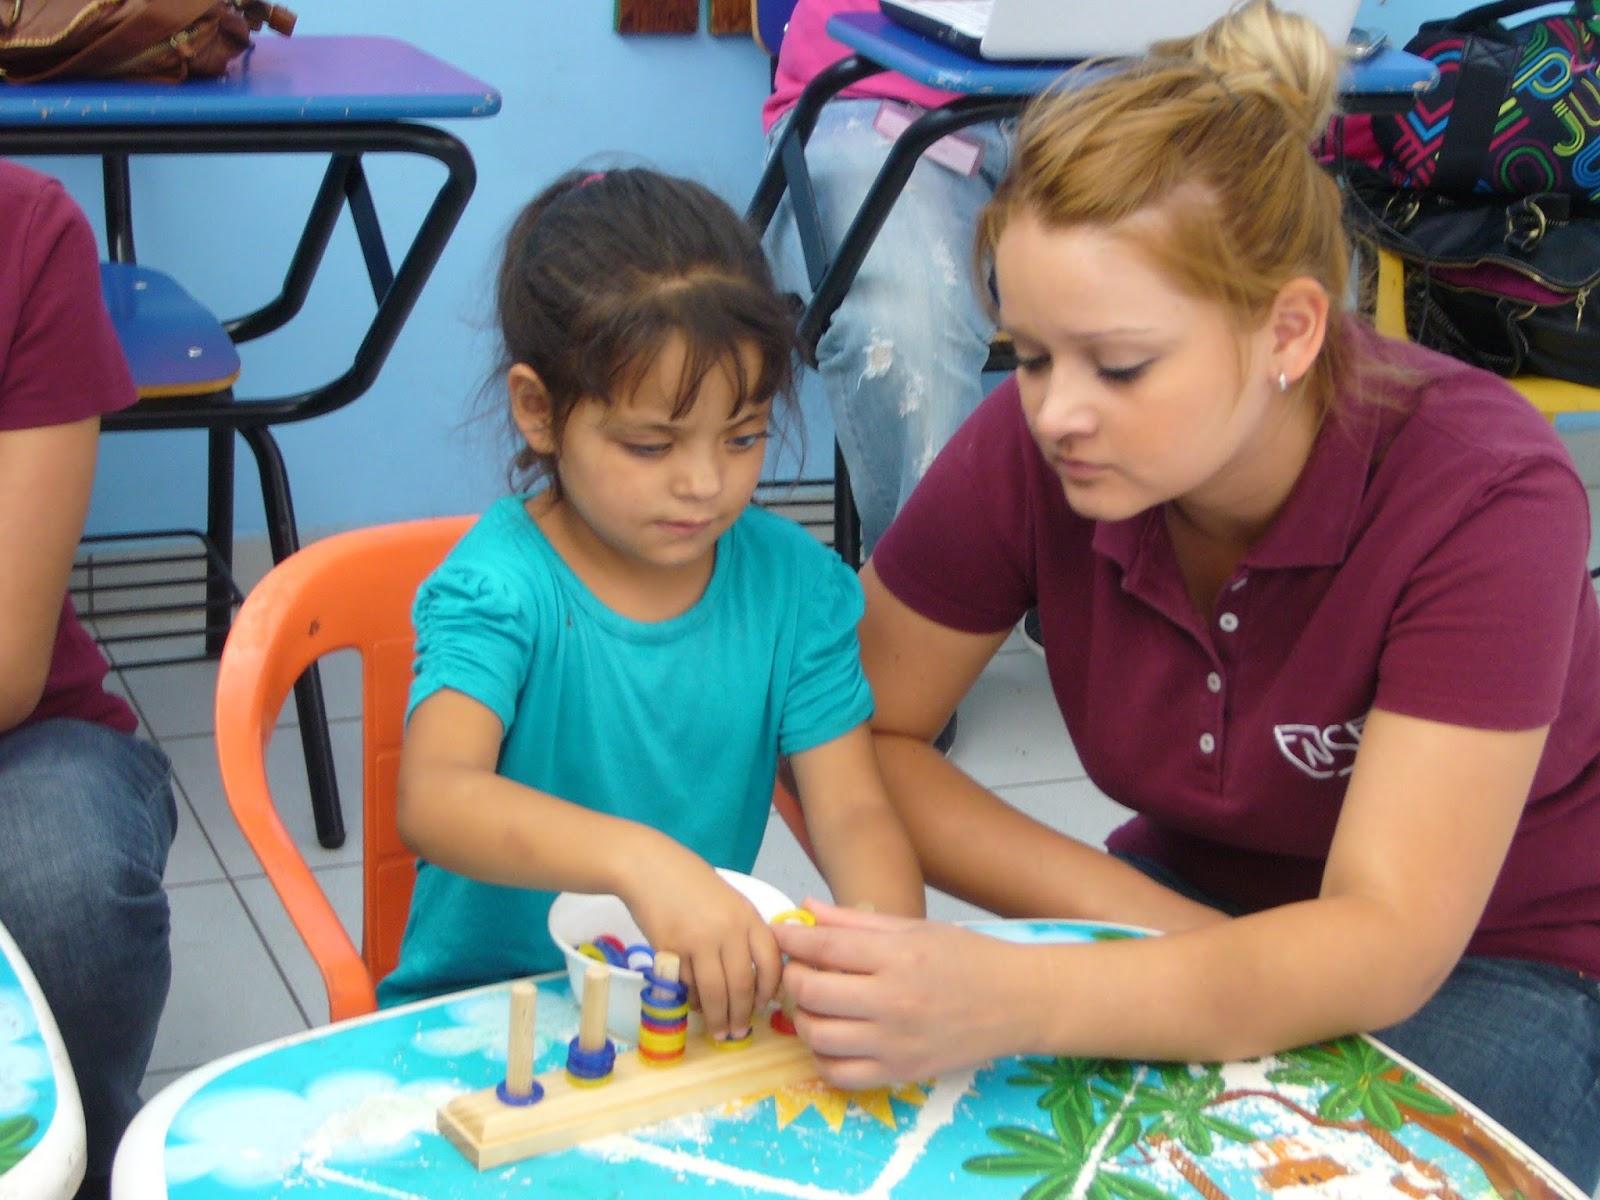 Escuela para ni os ciegos a c antes escuela para ni as for Actividades en el salon de clases